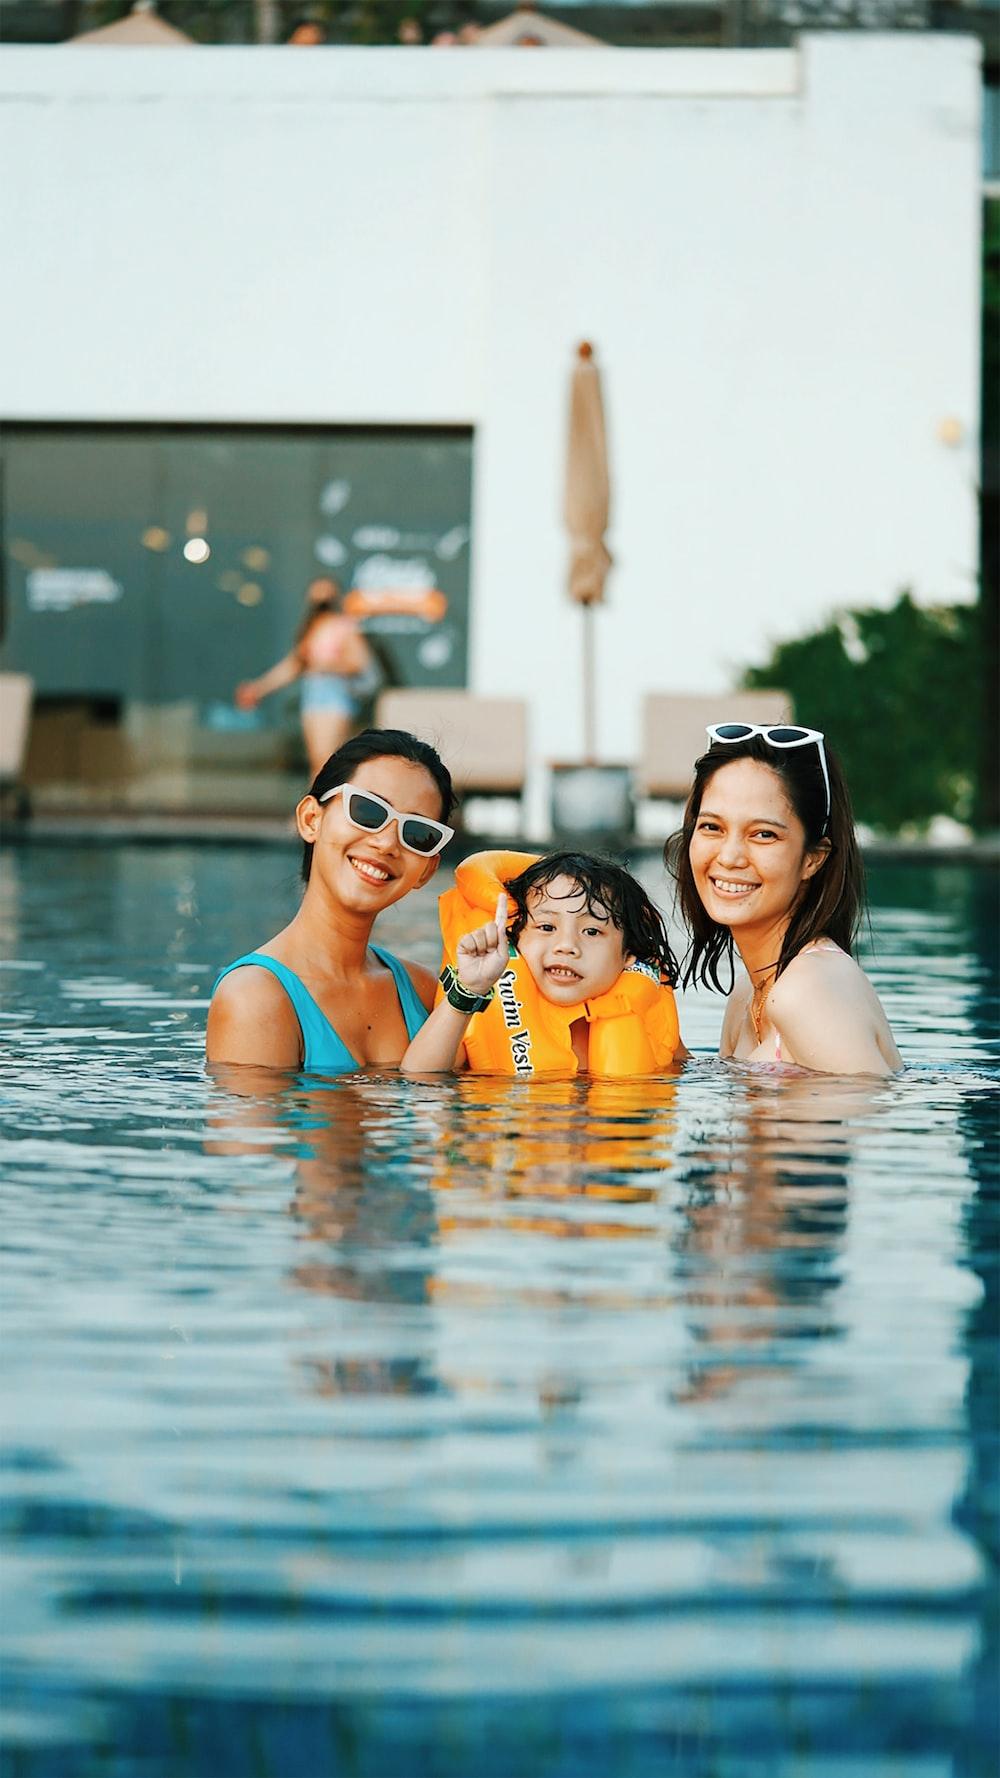 2 women in swimming pool posing for photo